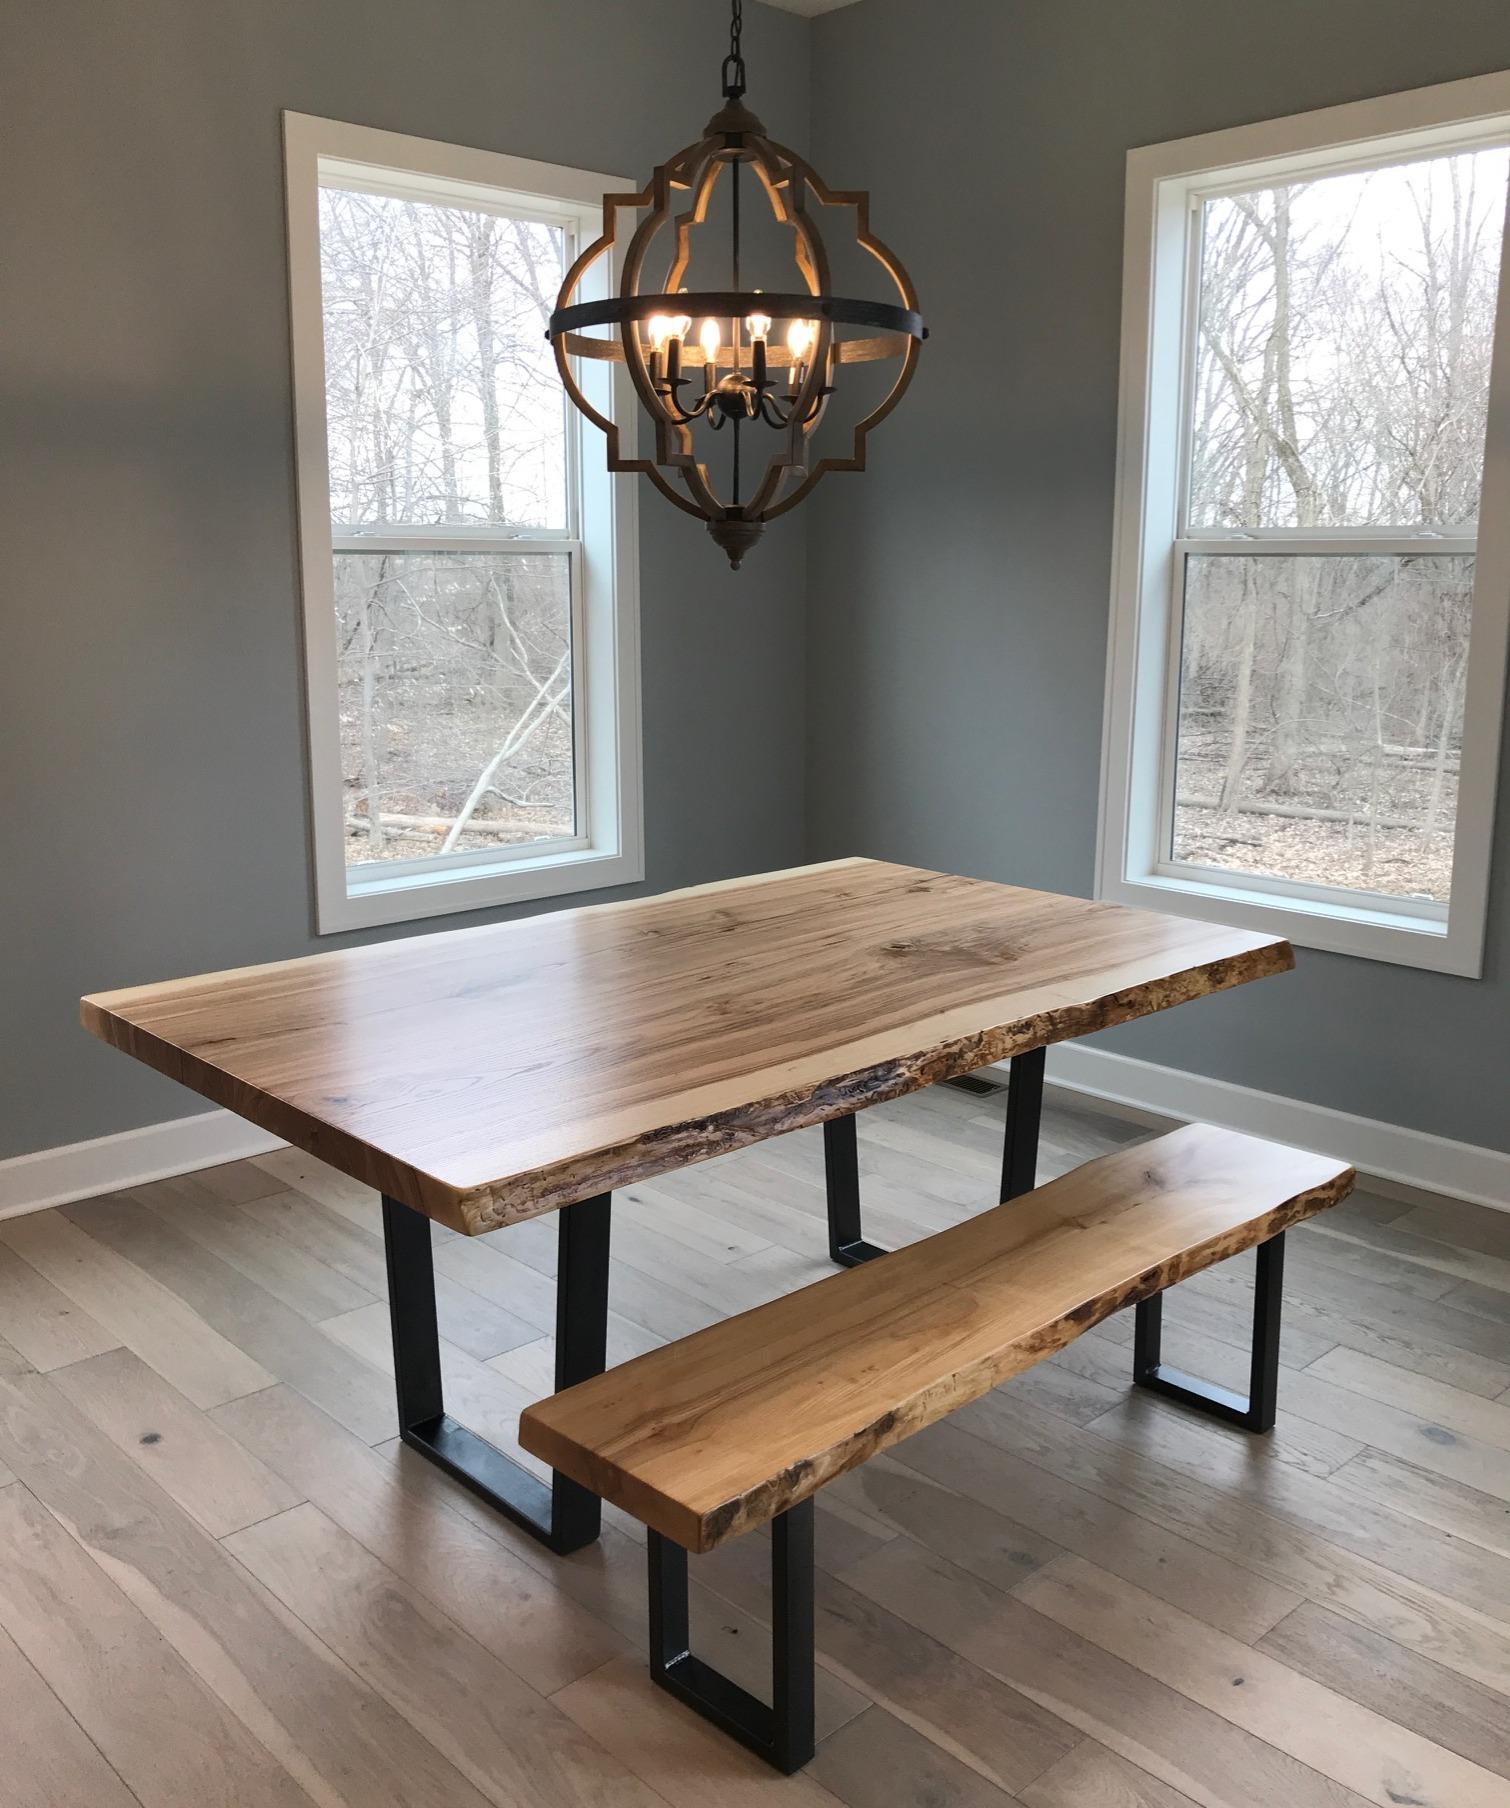 Strange Gallery Pathway Tables Custom Live Edge Tables Download Free Architecture Designs Rallybritishbridgeorg